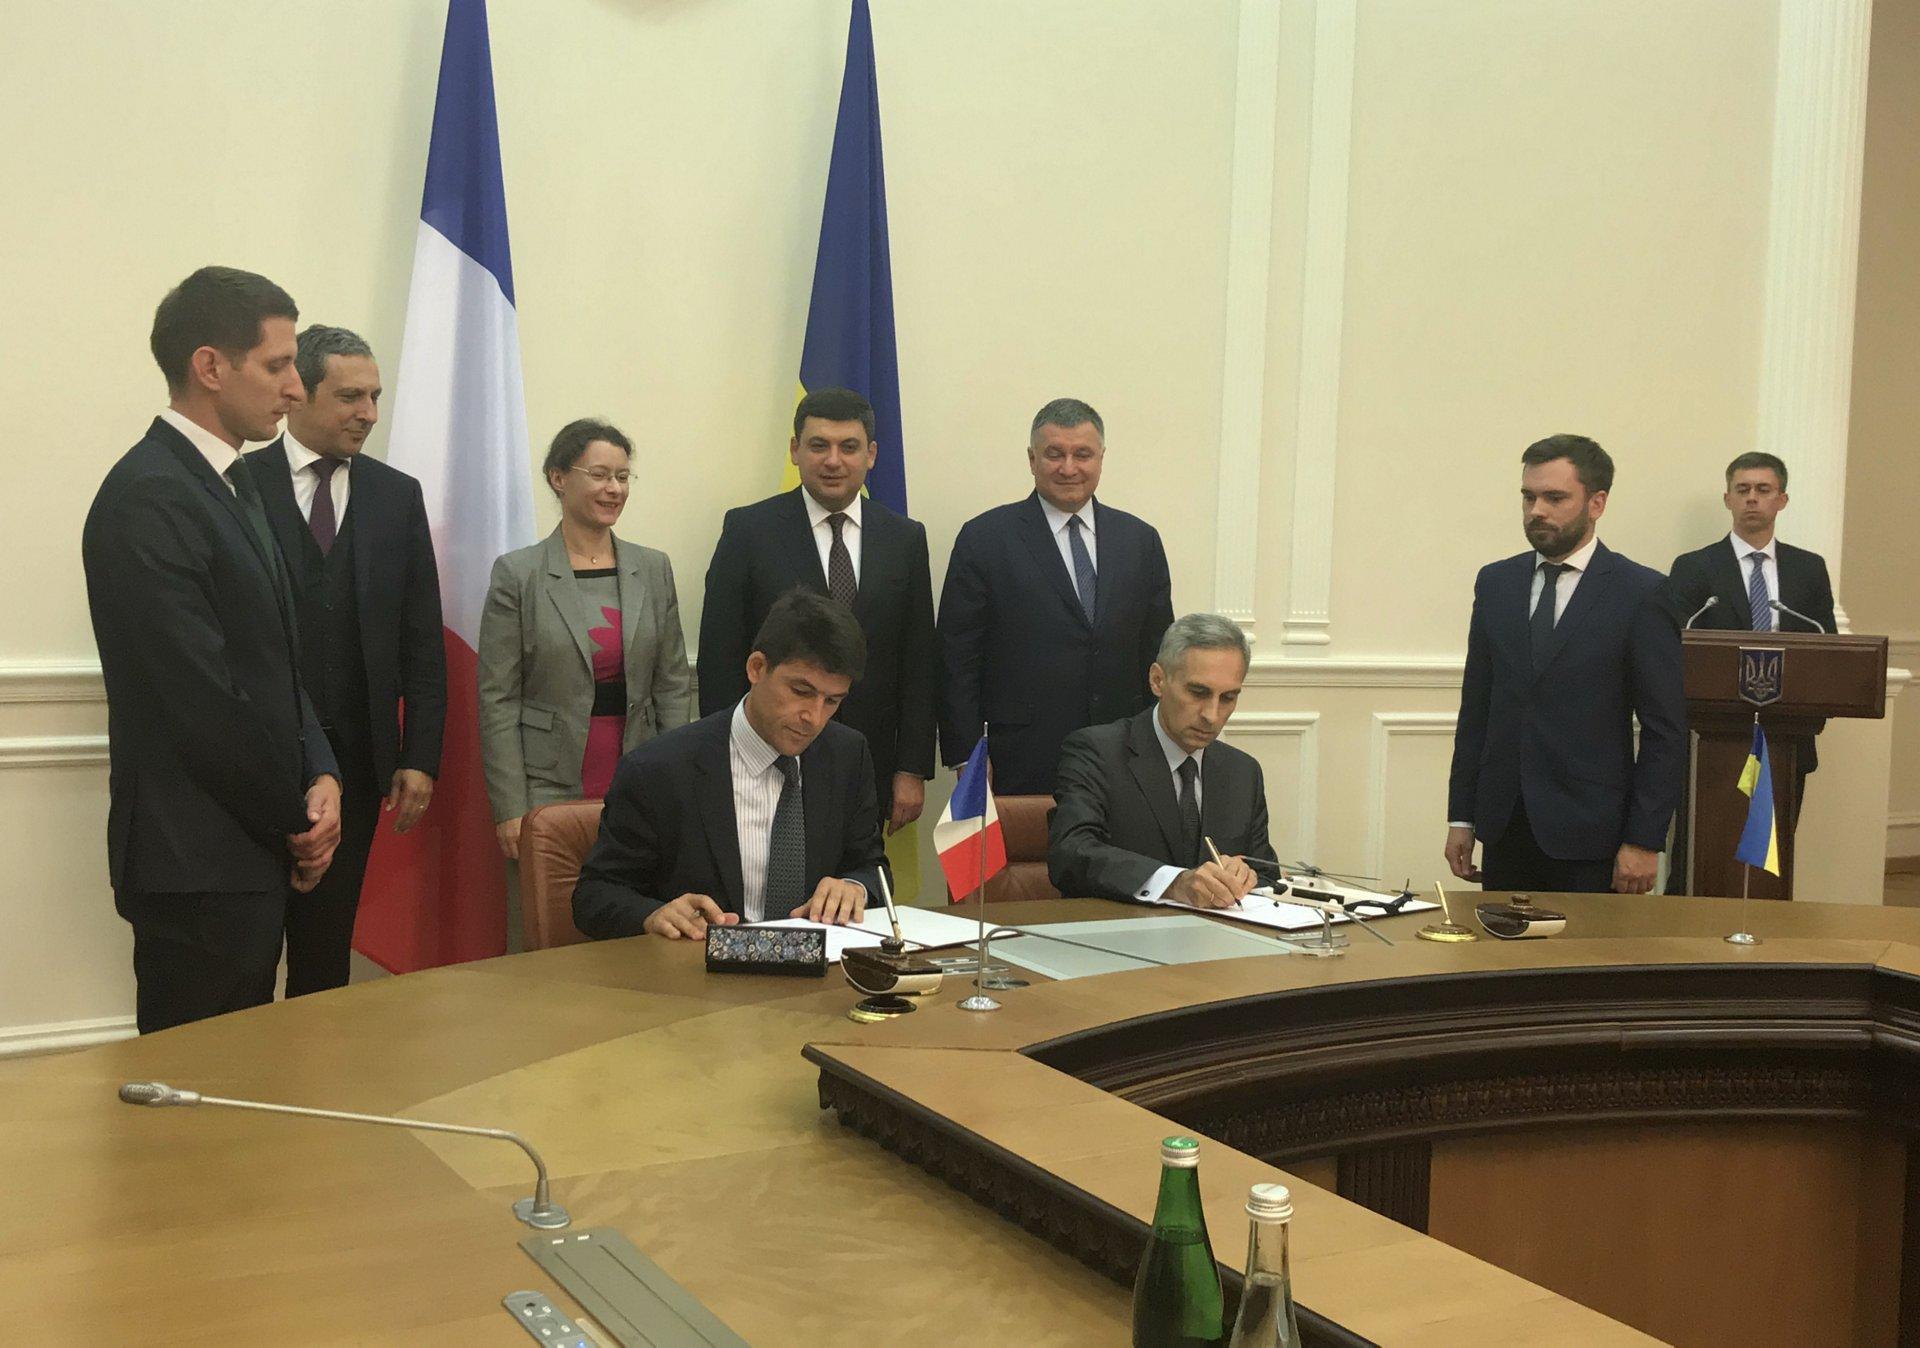 Ukraine Signing Helicopters